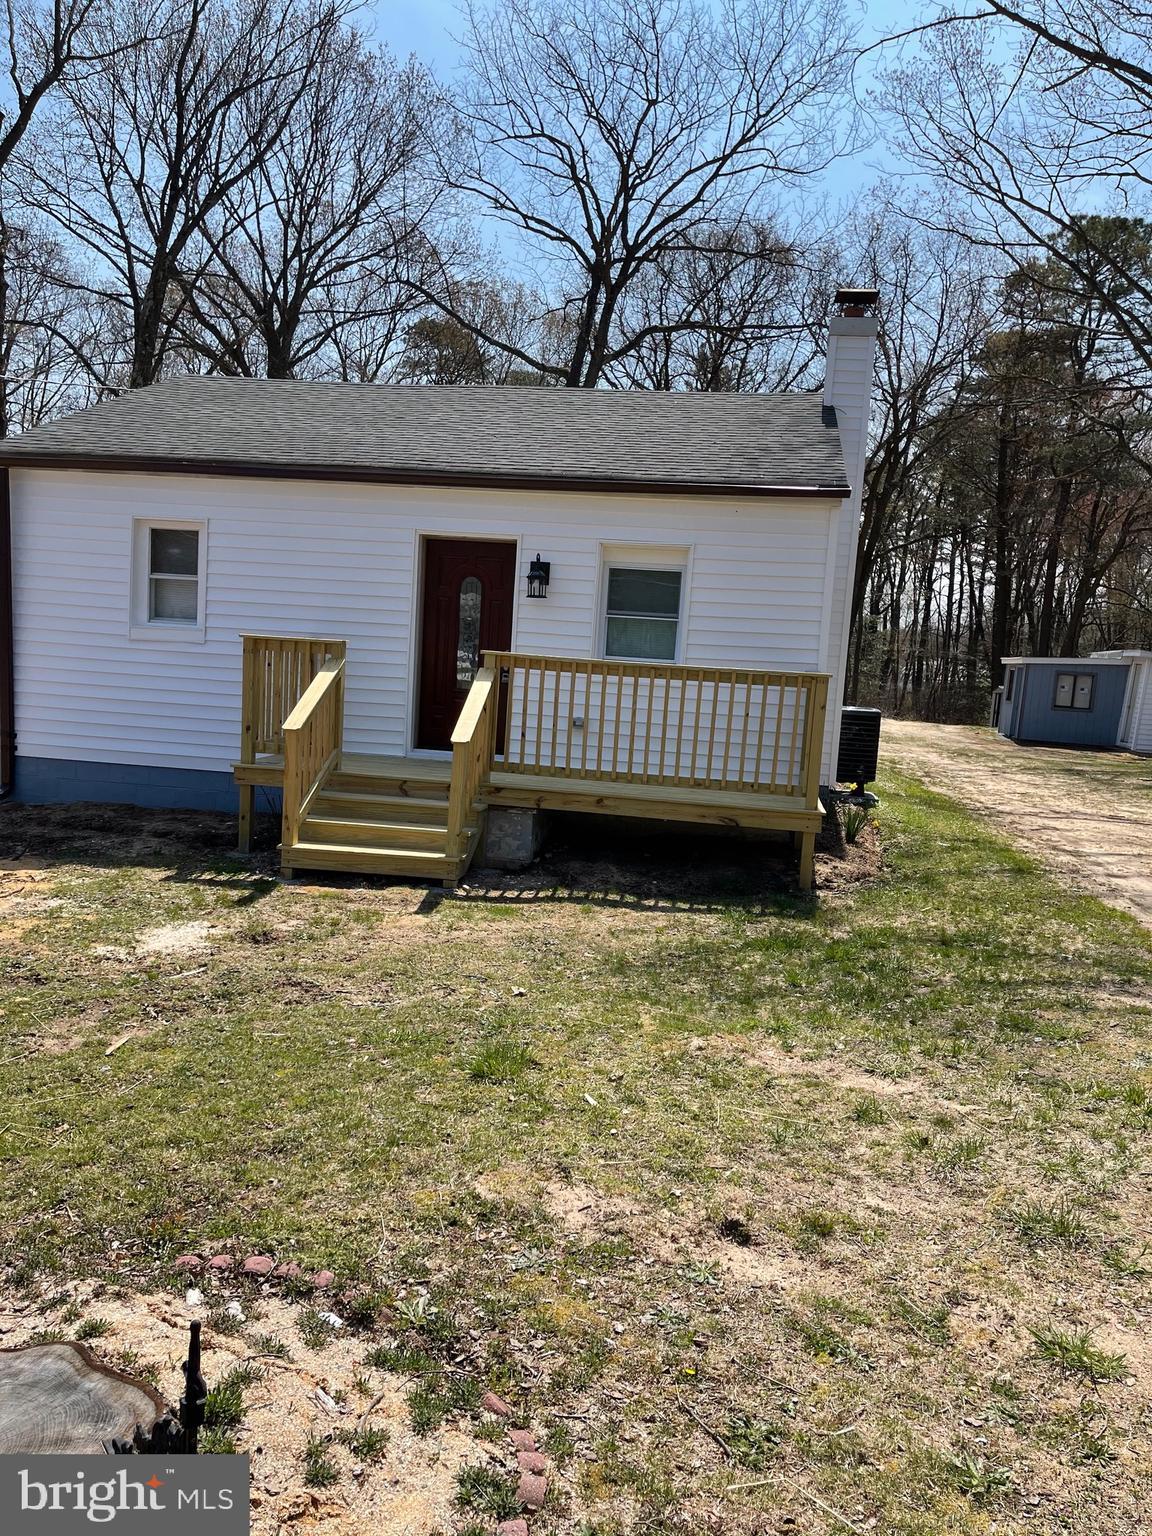 223 OBRECHT ROAD, MILLERSVILLE, Maryland 21108, 2 Bedrooms Bedrooms, ,2 BathroomsBathrooms,Single Family,For Sale,223 OBRECHT ROAD,MDAA463924